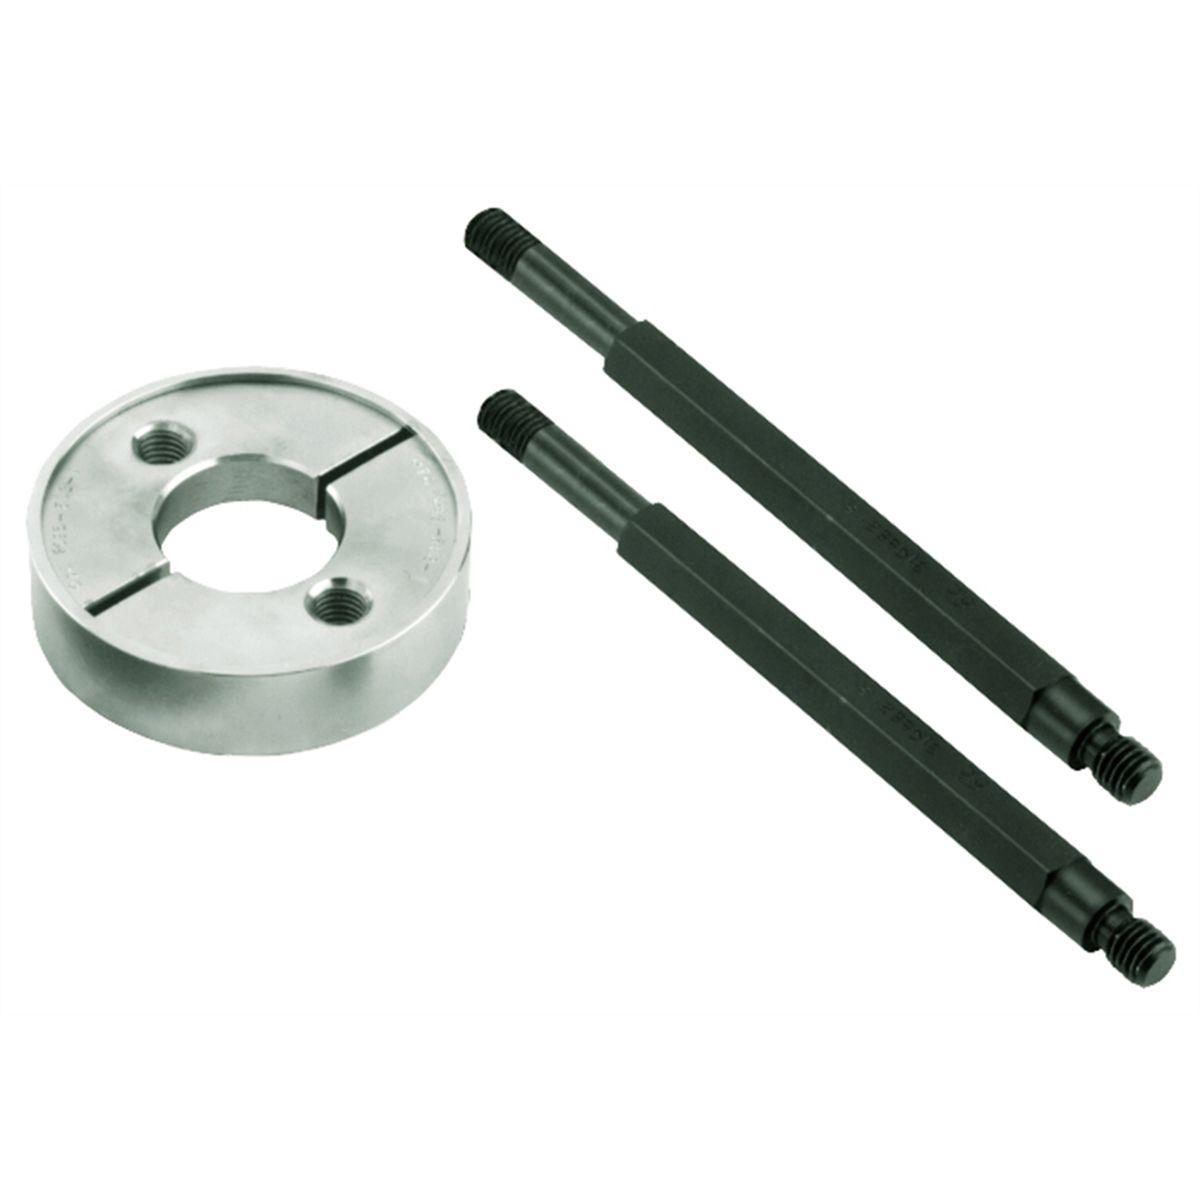 Bearing Pullers Images : Bearing puller set otc